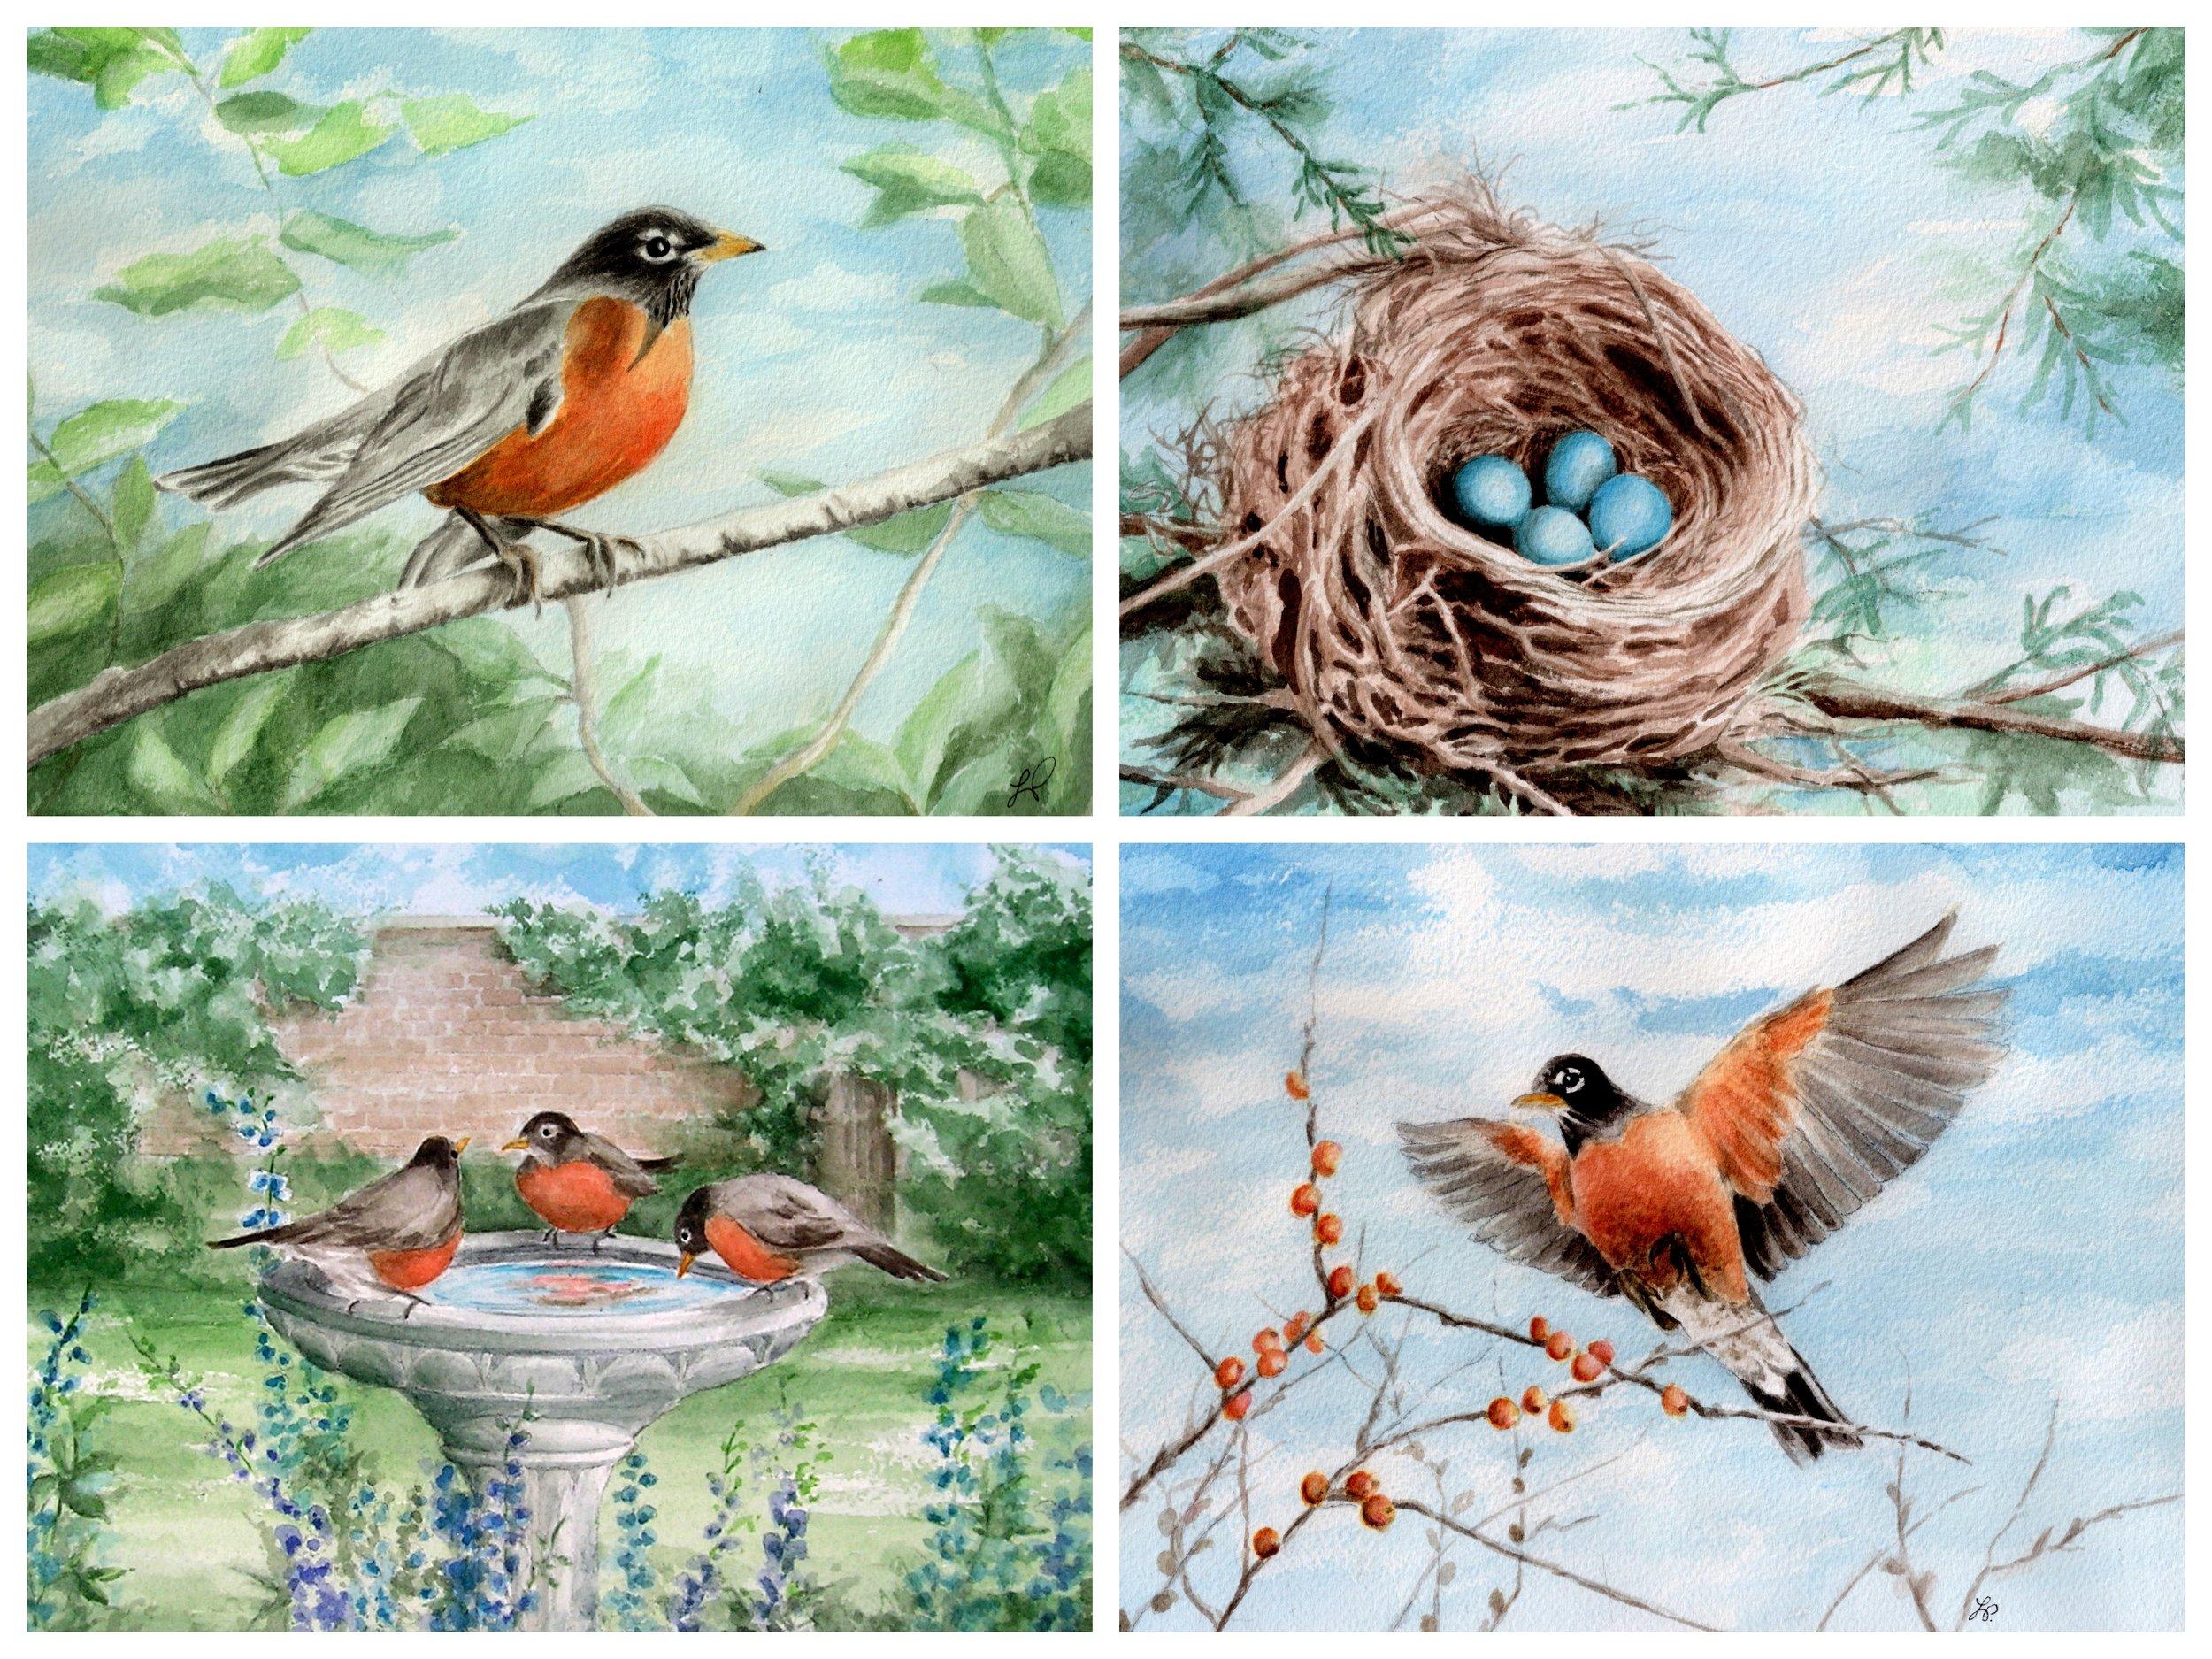 FOUR DIFFERENT ROBIN SCENES - SIZE 5 X 7    Robin Perching, Robin Eggs, Birdbath, Or Flying Robin